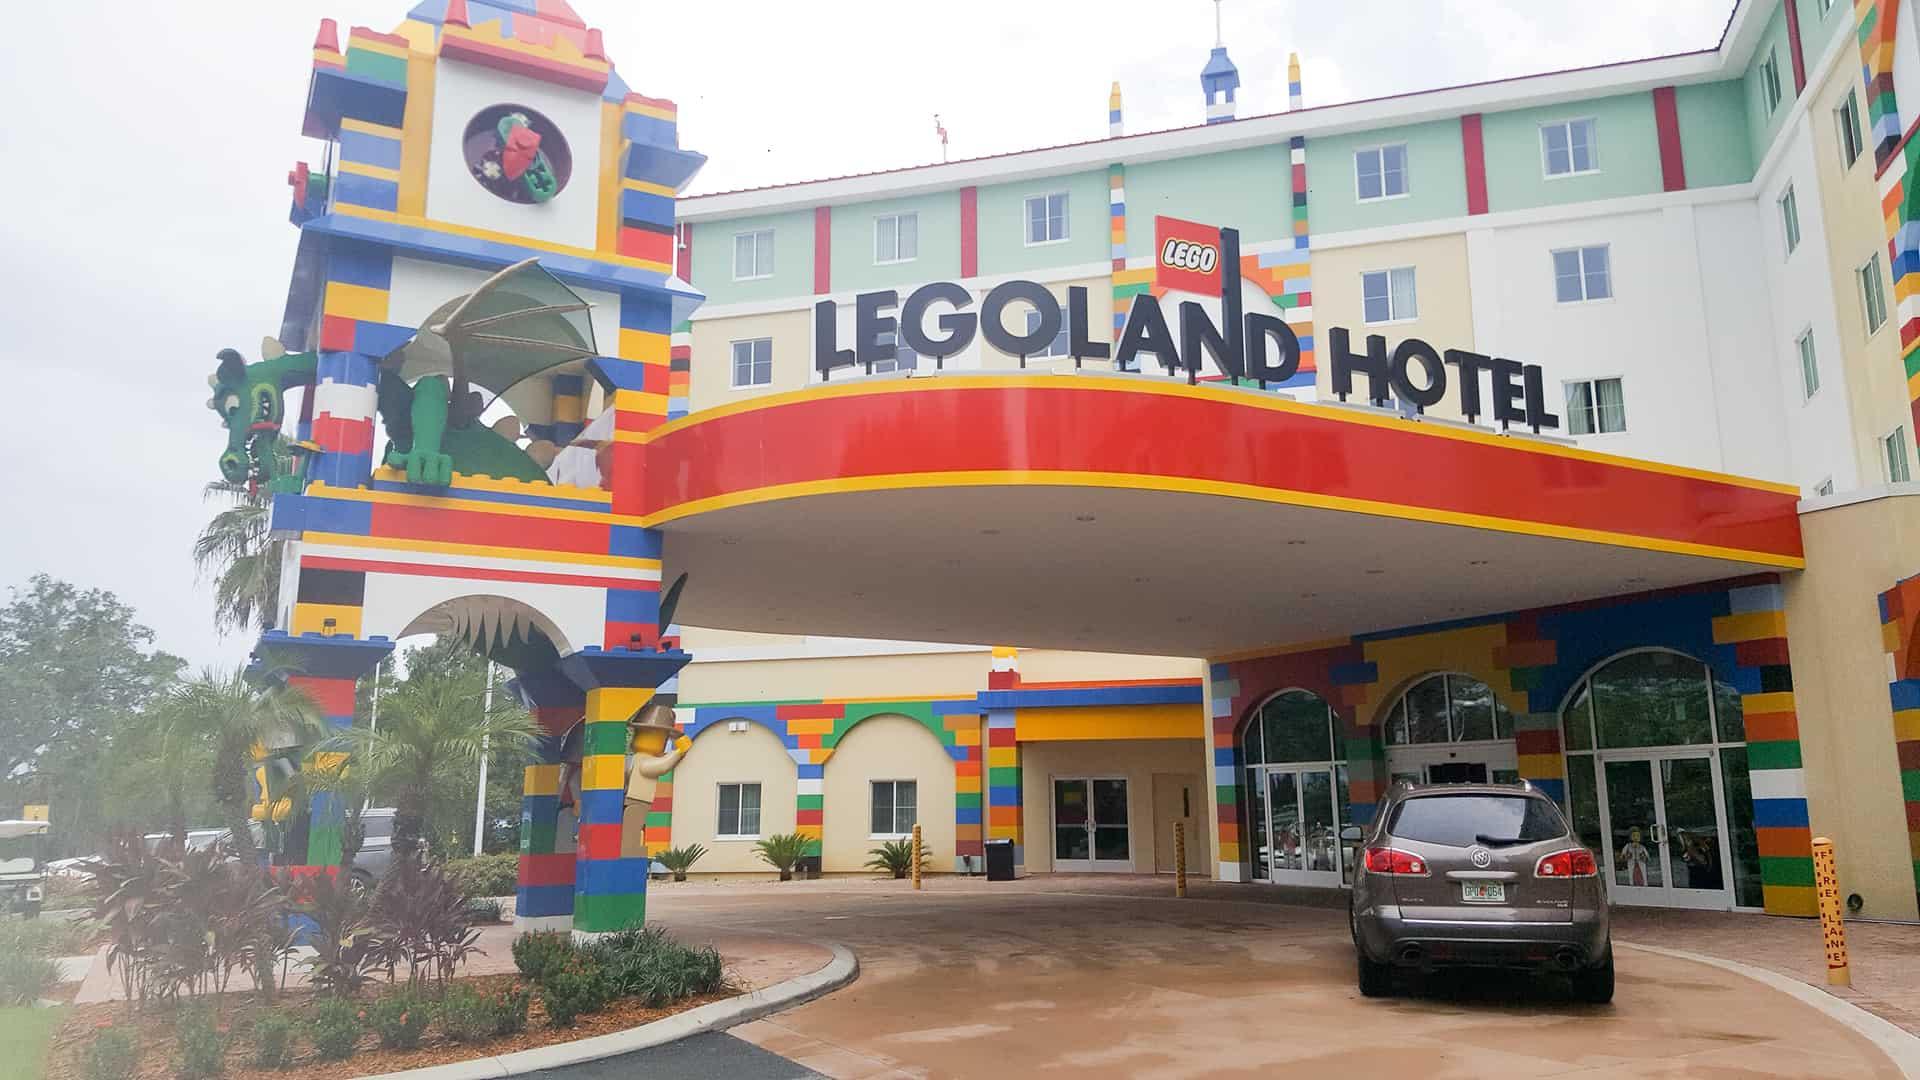 Legoland Florida Hotel - Front View